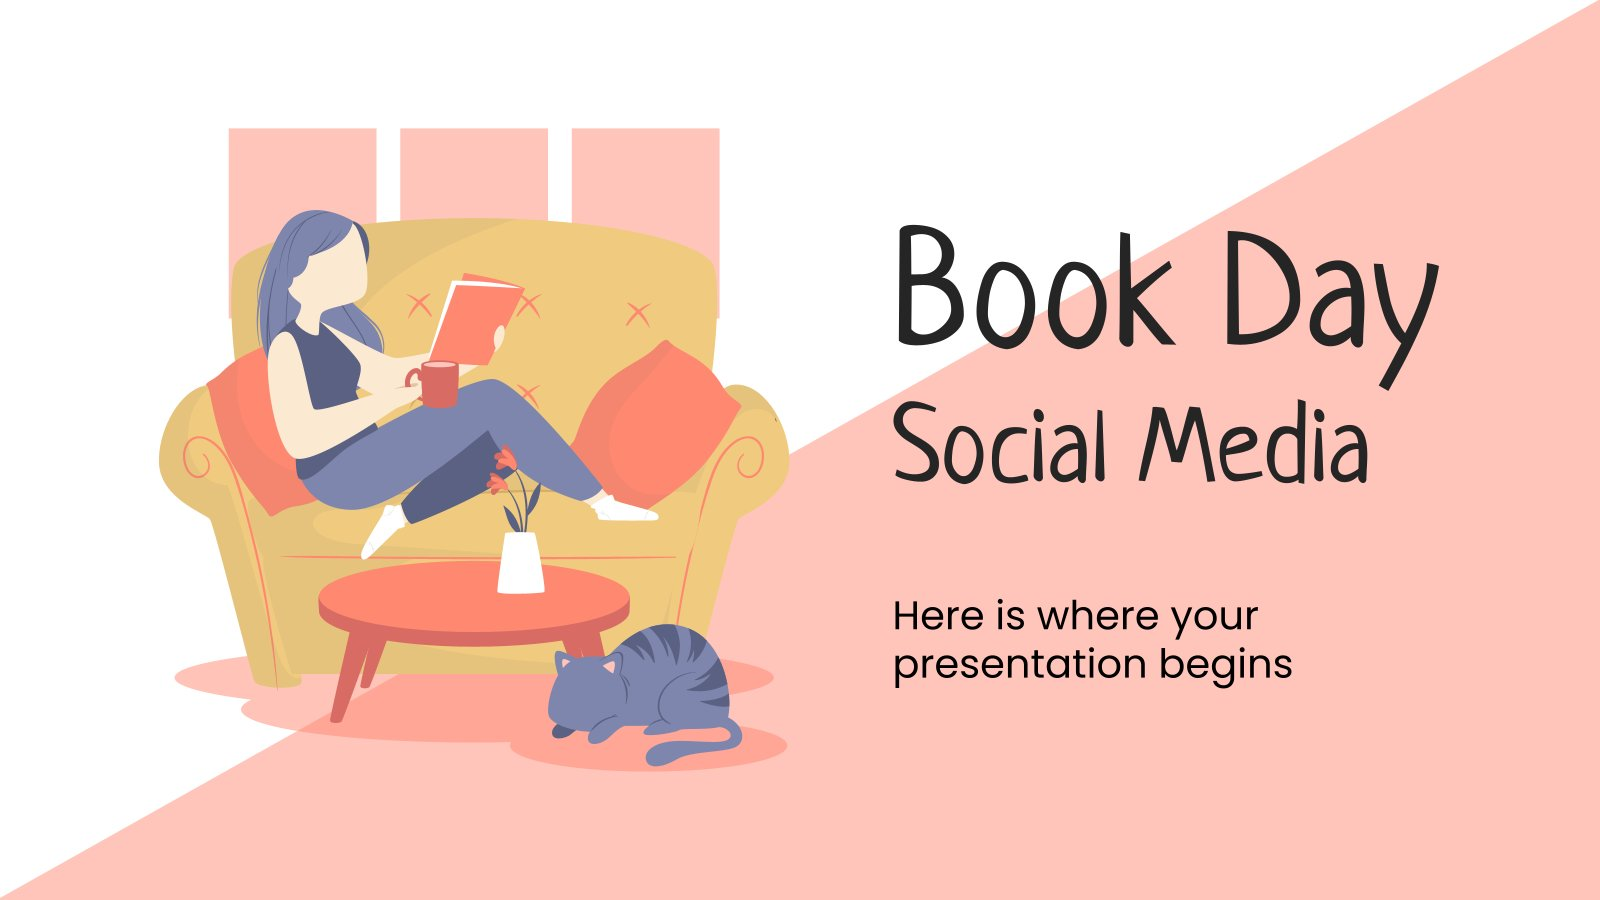 Book Day Social Media presentation template